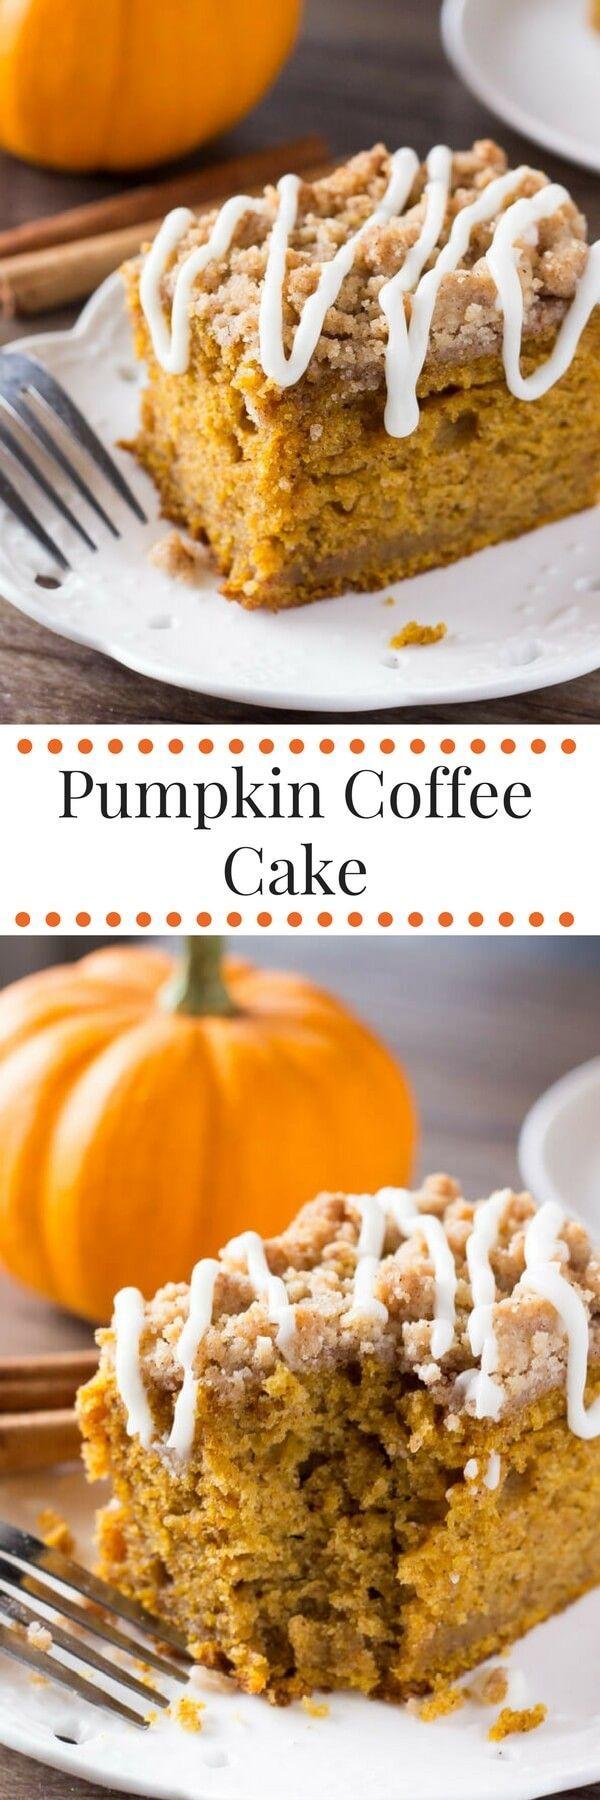 Pumpkin Coffee Cake Recipe Pumpkin coffee cakes